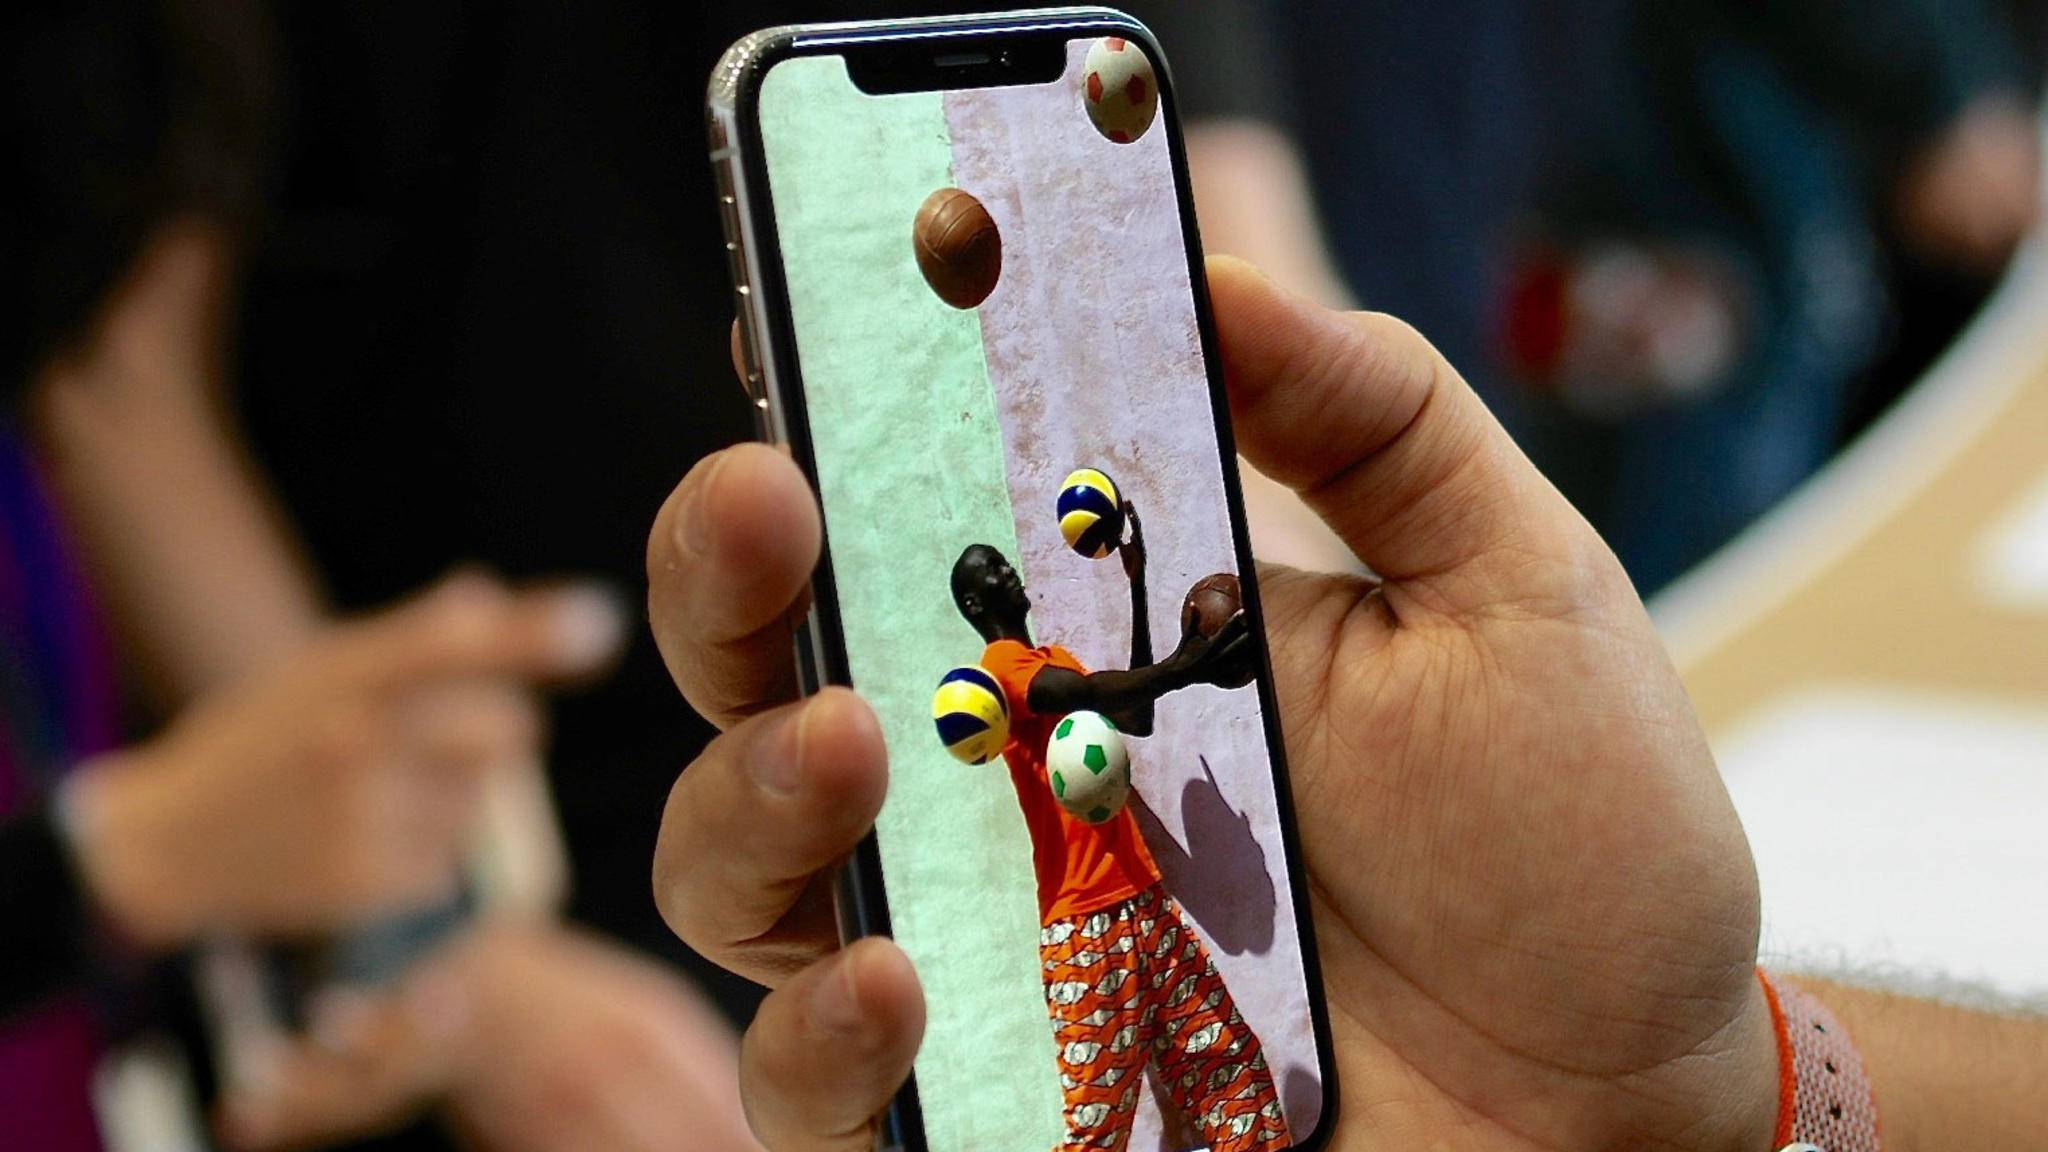 Streit um das nächste iPhone: Apple vs Qualcomm.